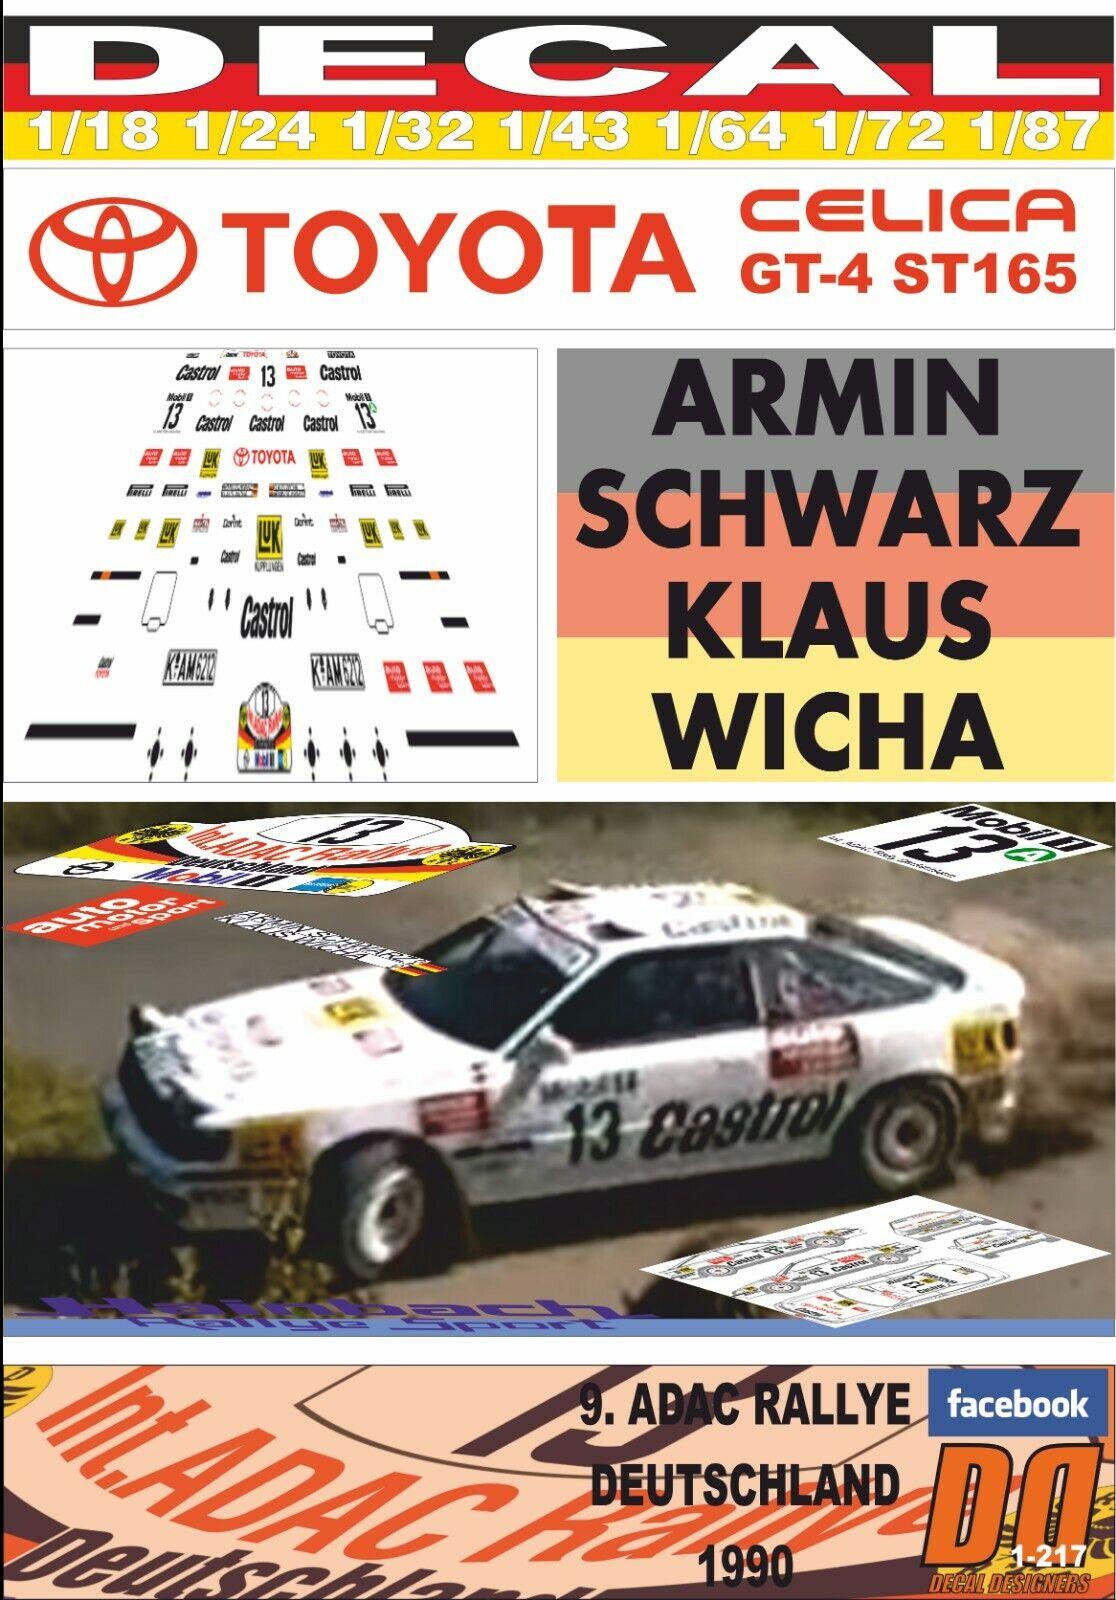 DECAL leksakOTA CEICA GT -4 ST165 A.svkonst R.DEUTSCHLAND 1990 -22nd (03)